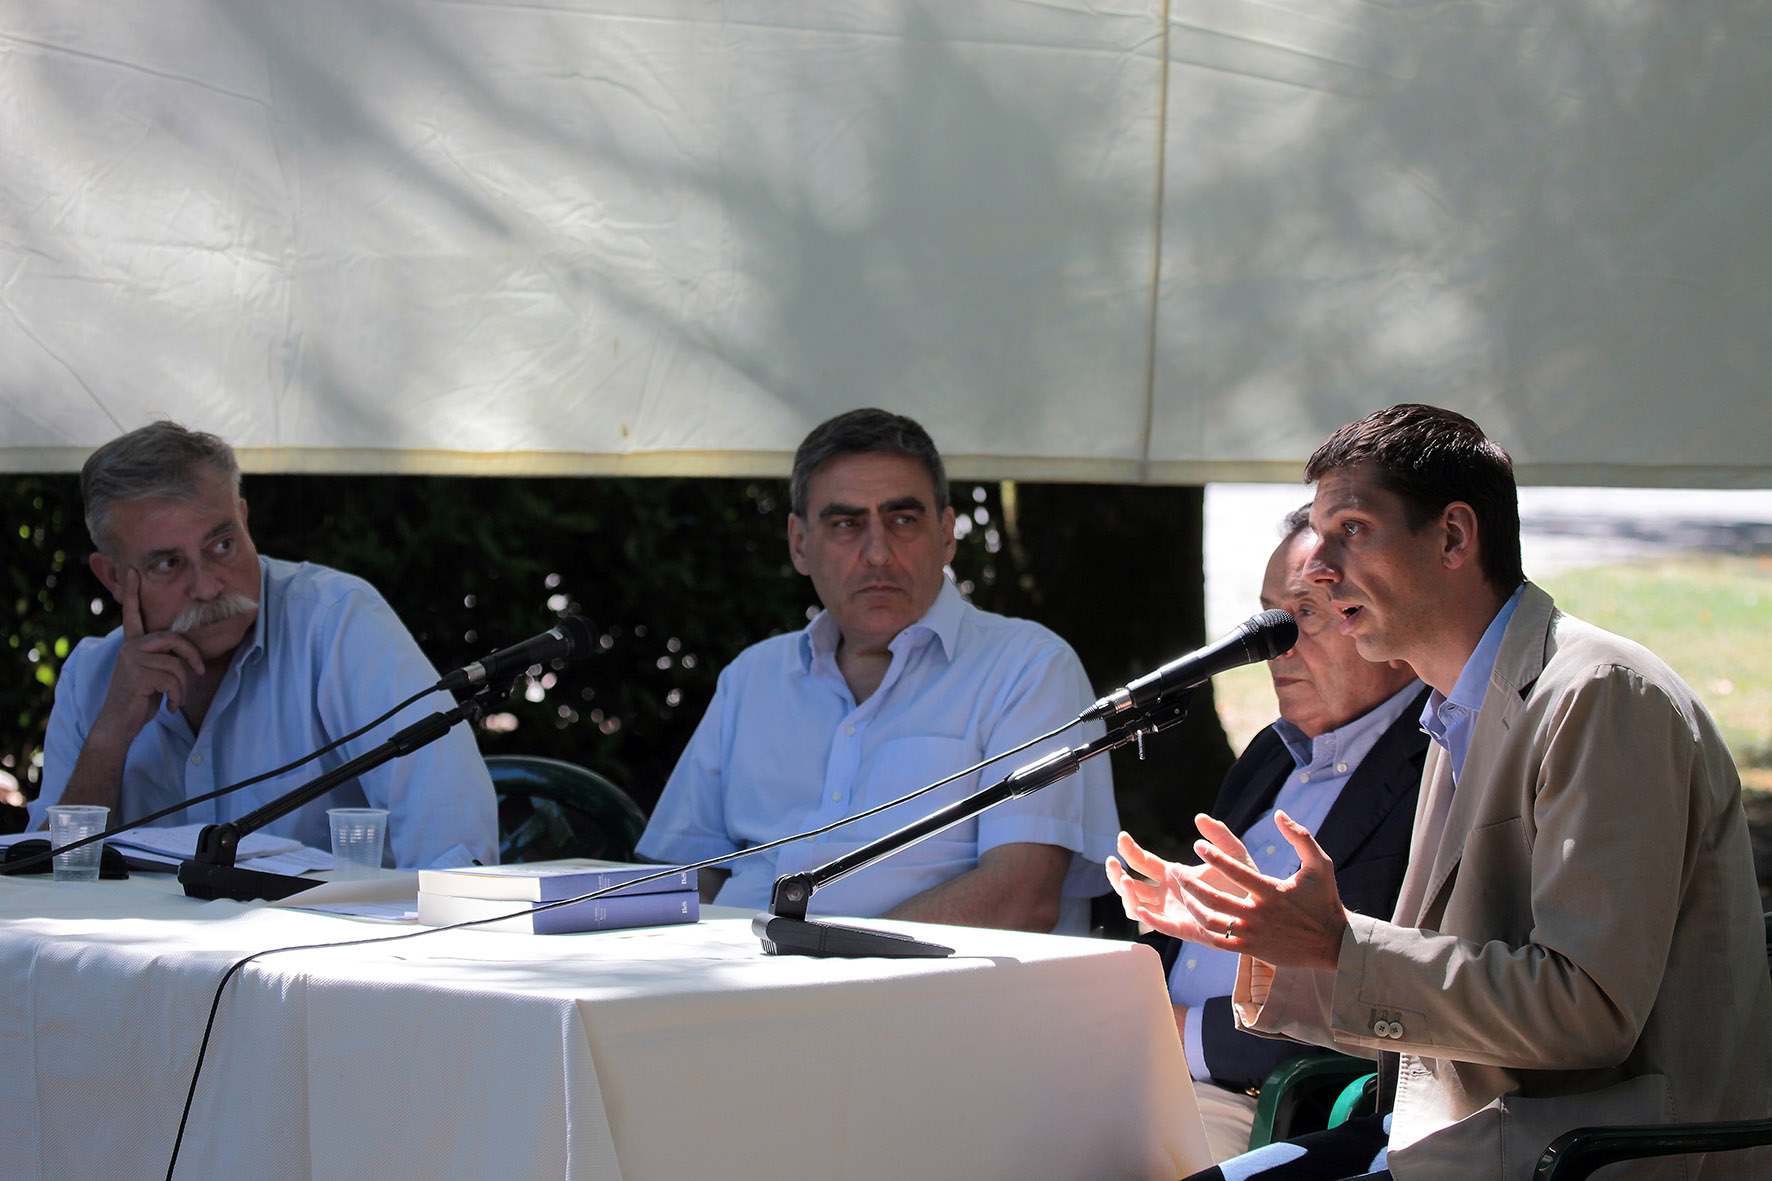 conferenza stampa 1